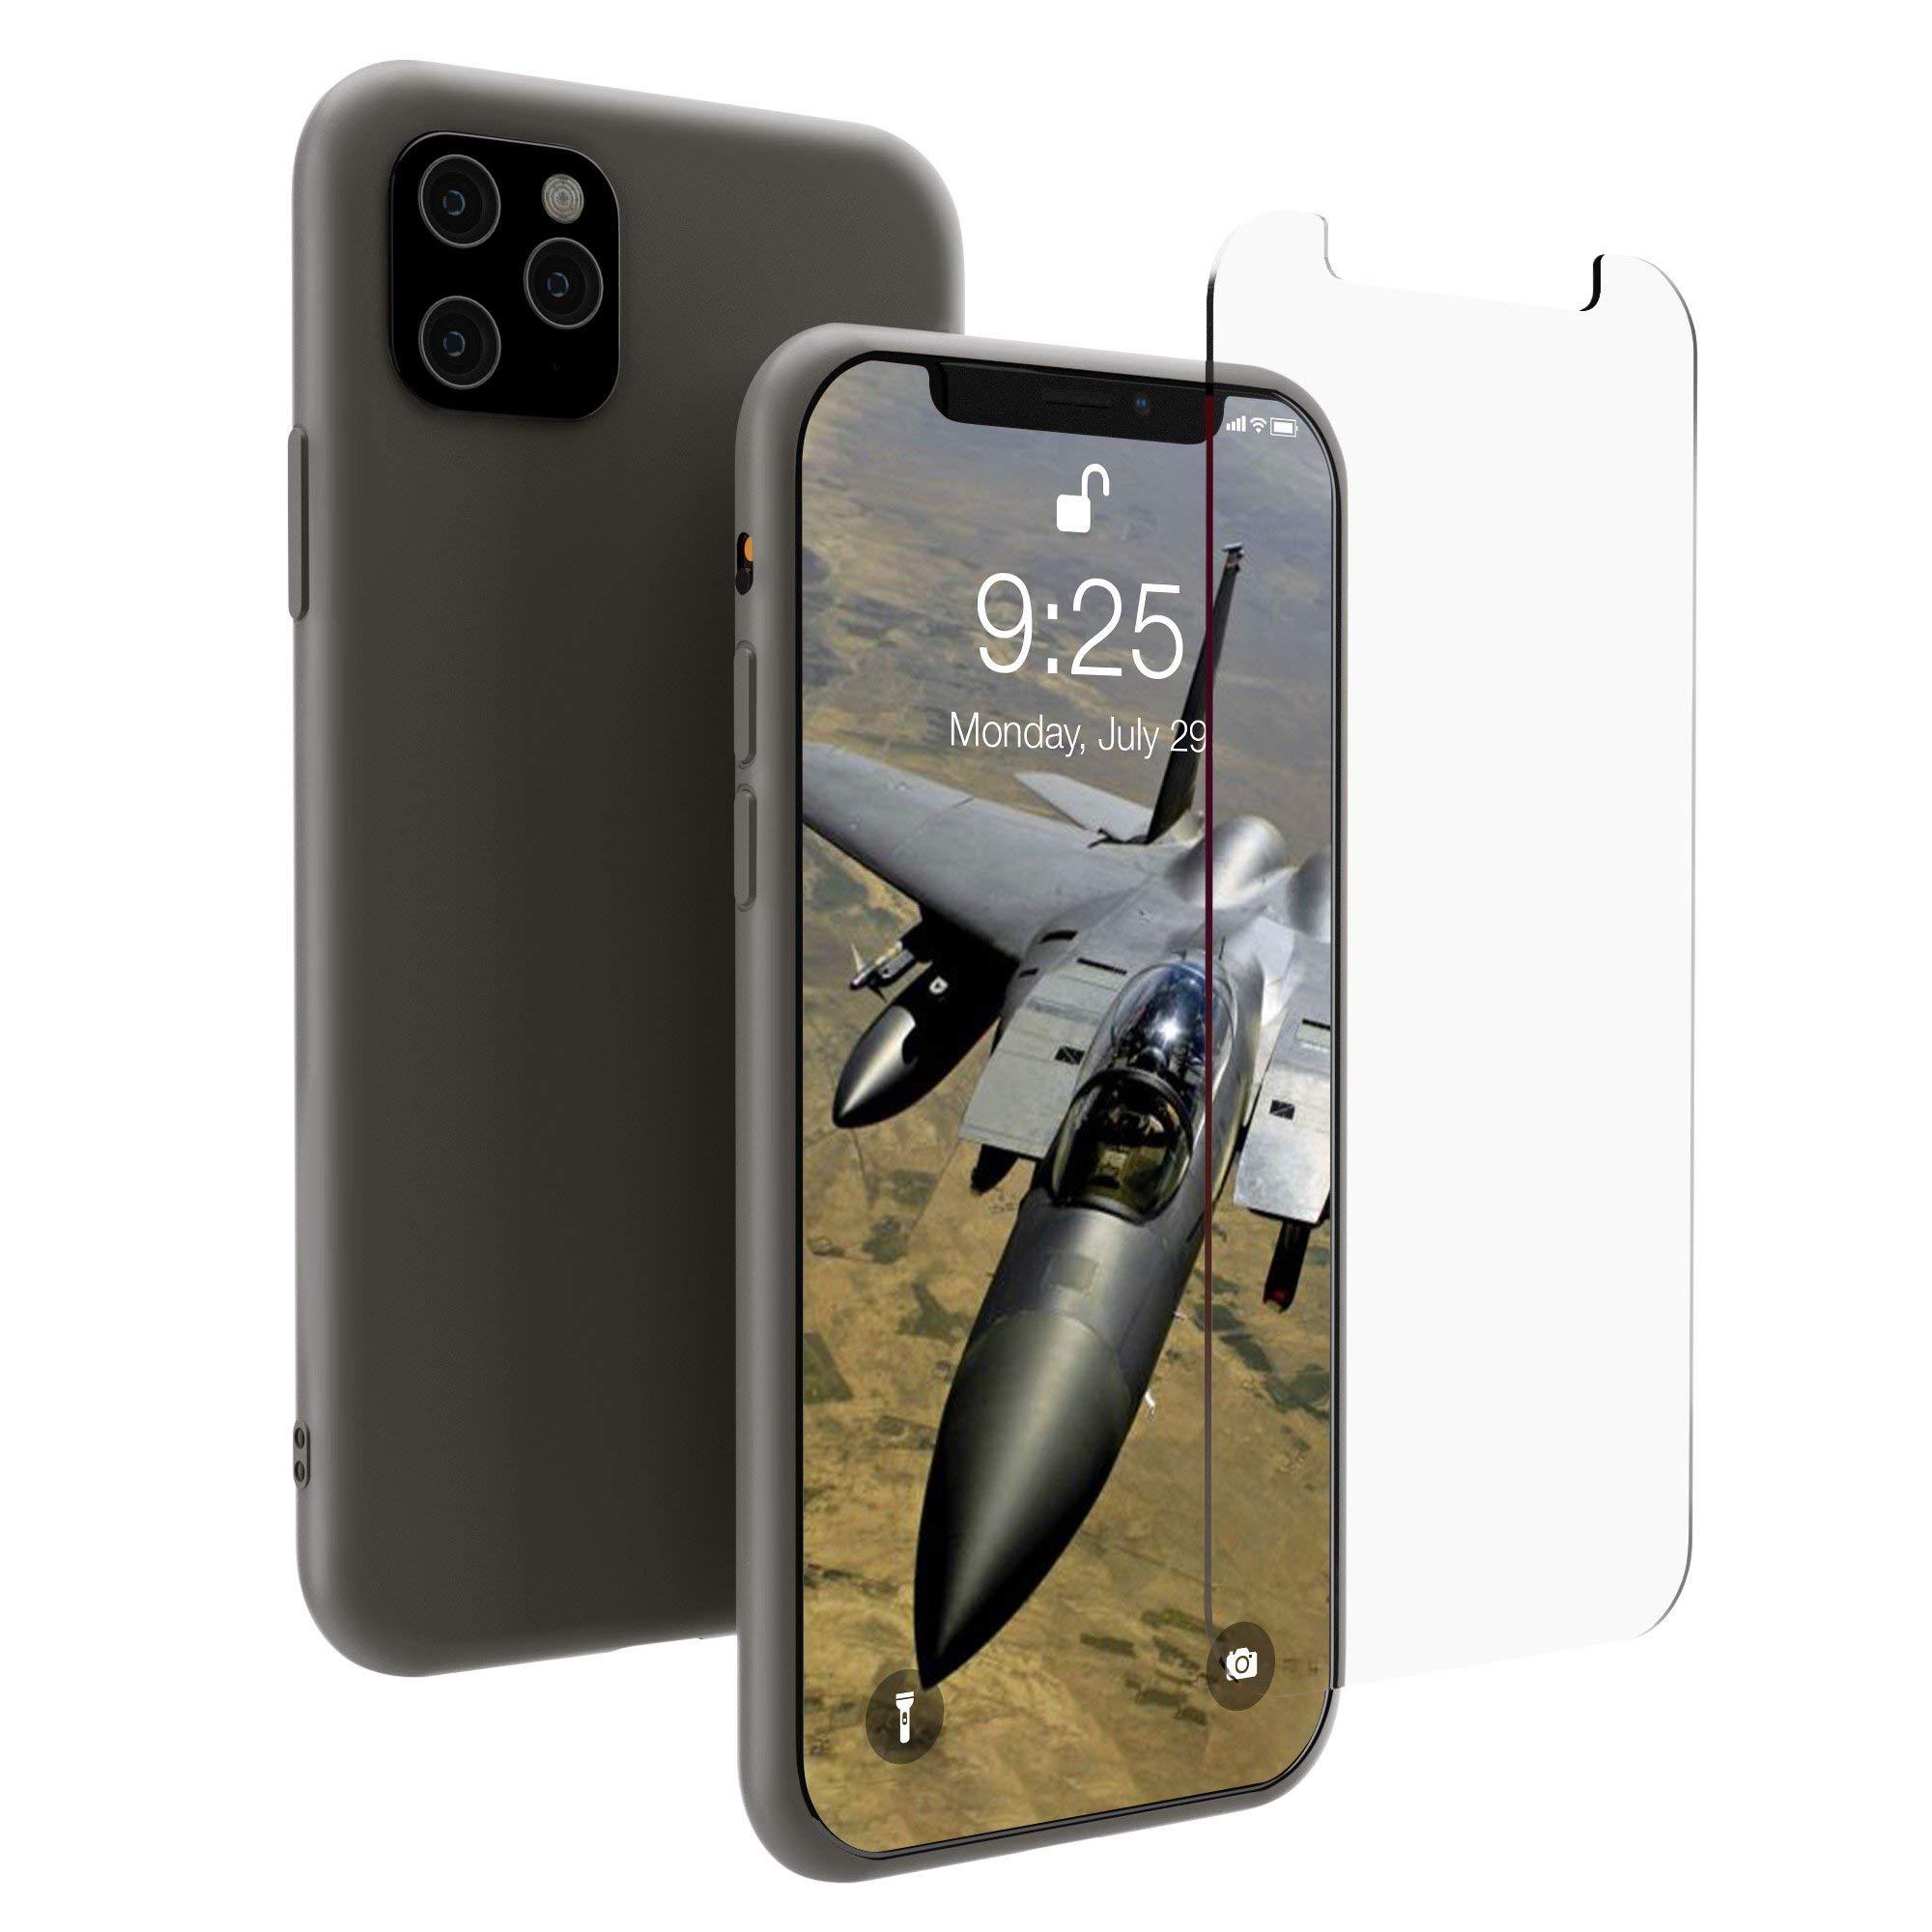 Funda + Vidrio iPhone 11 Pro Owm [7w45ltv3]